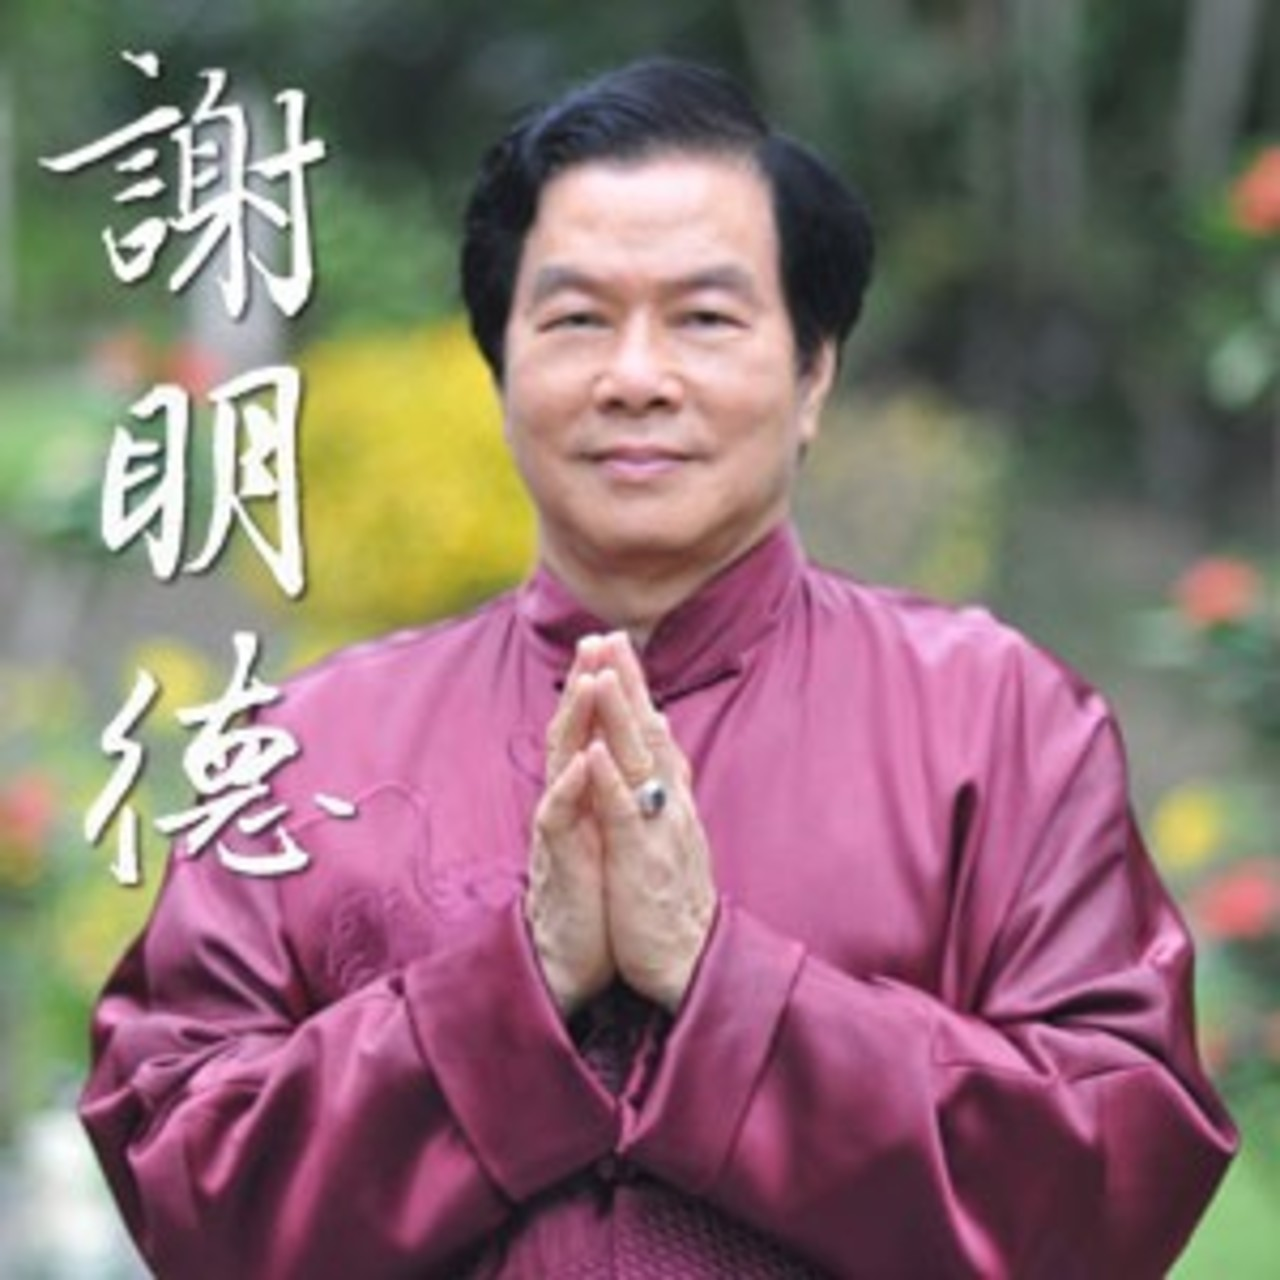 mantak chia  Mantak Chia's Universal Healing Tao - June 12-28, 2018 - Event ...